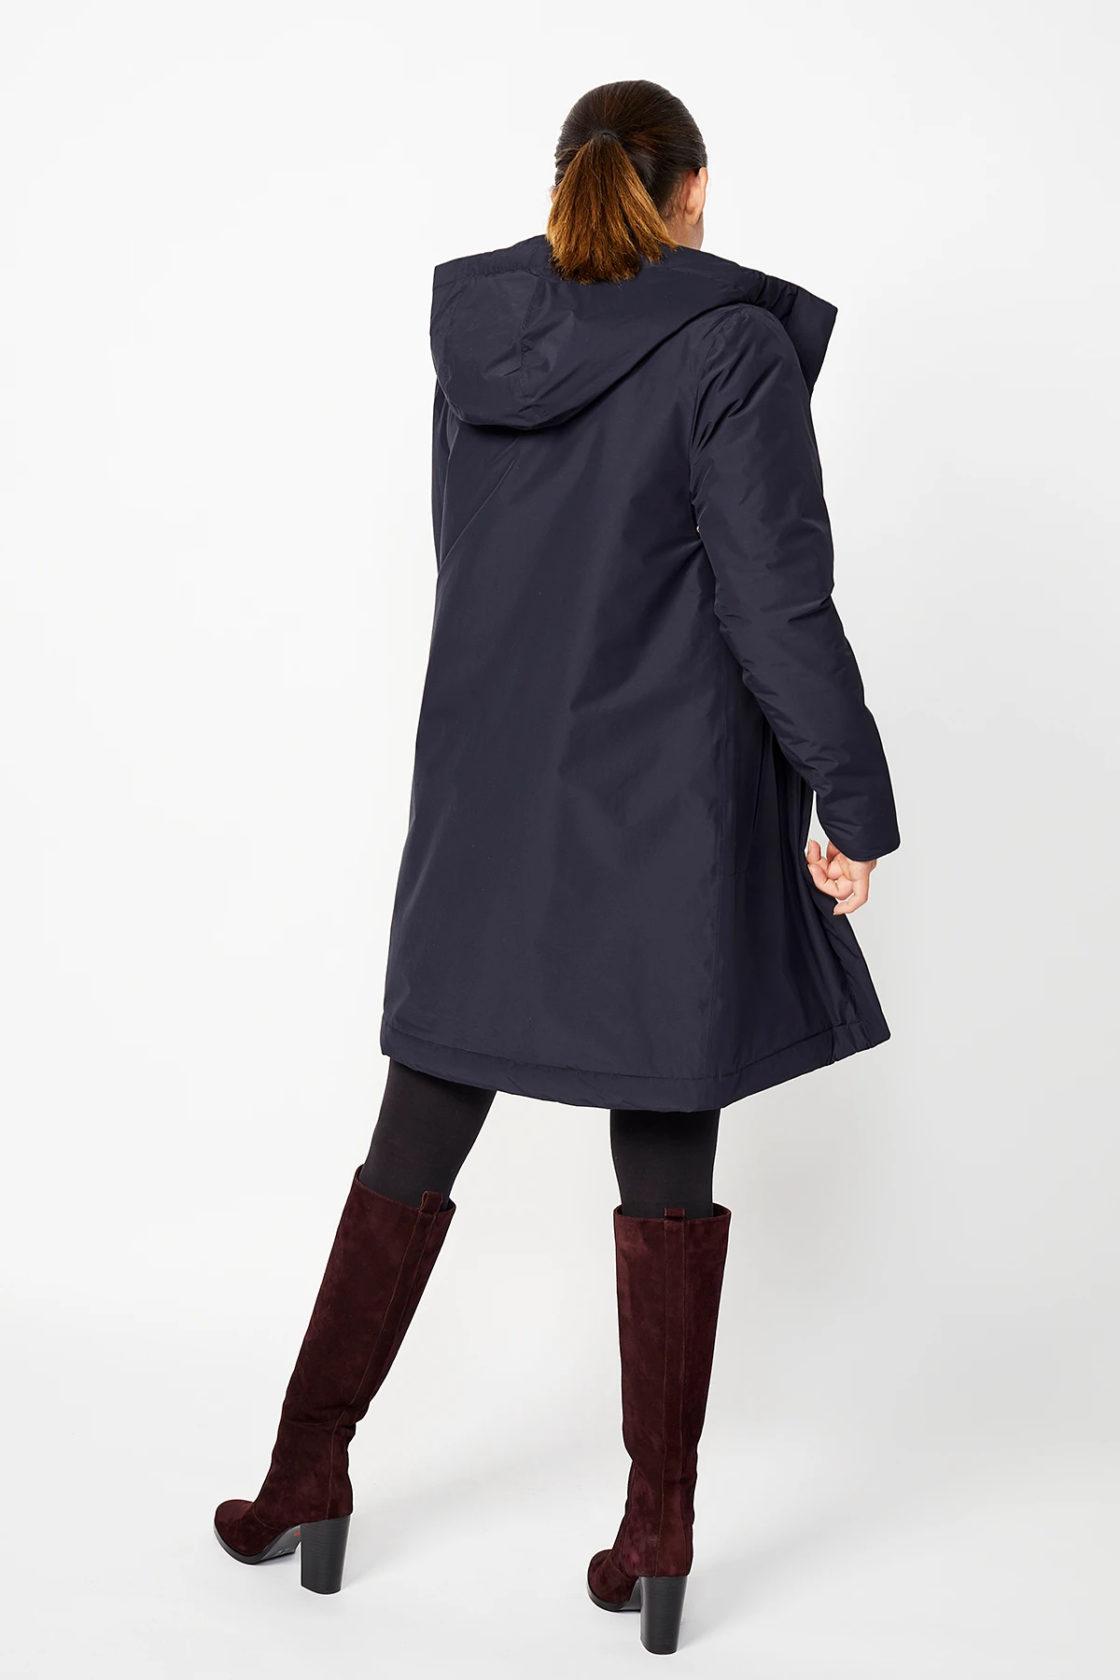 Roberta Organic Fashion Langerchen Coat Ariza Navy 2